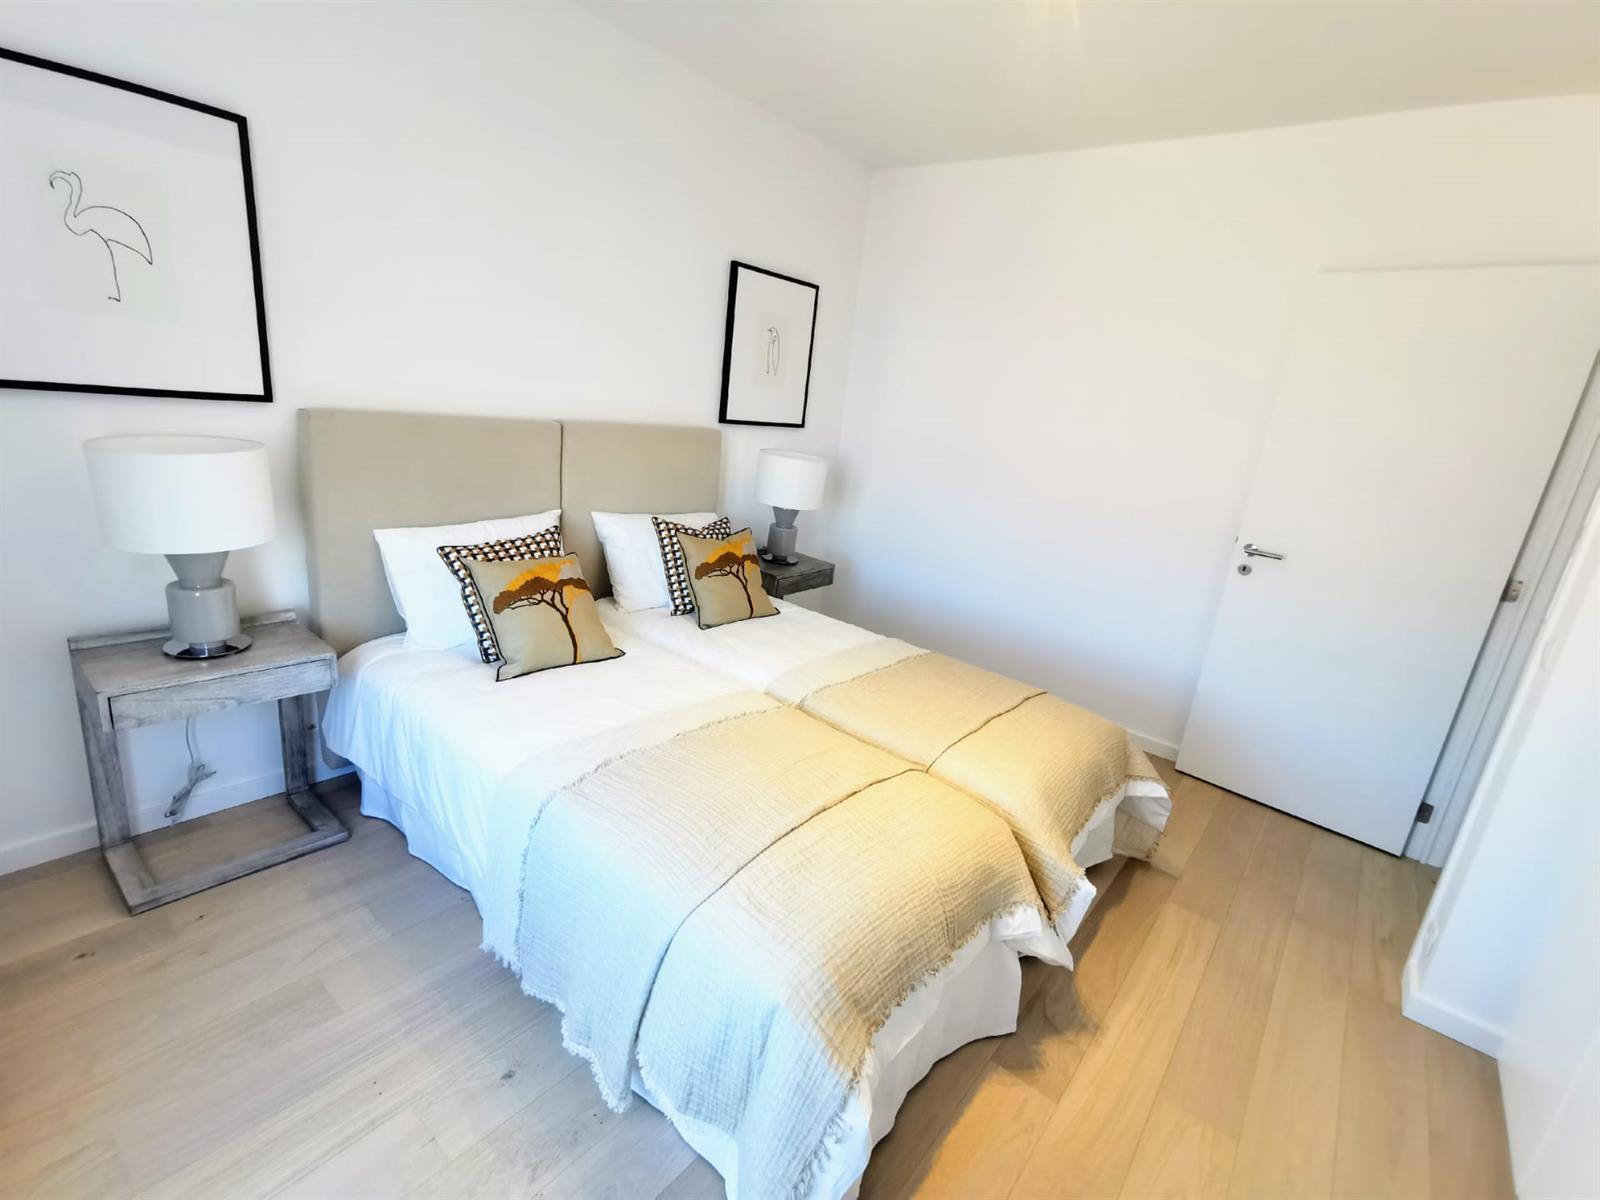 Appartement - Woluwe-Saint-Lambert - #4455516-11